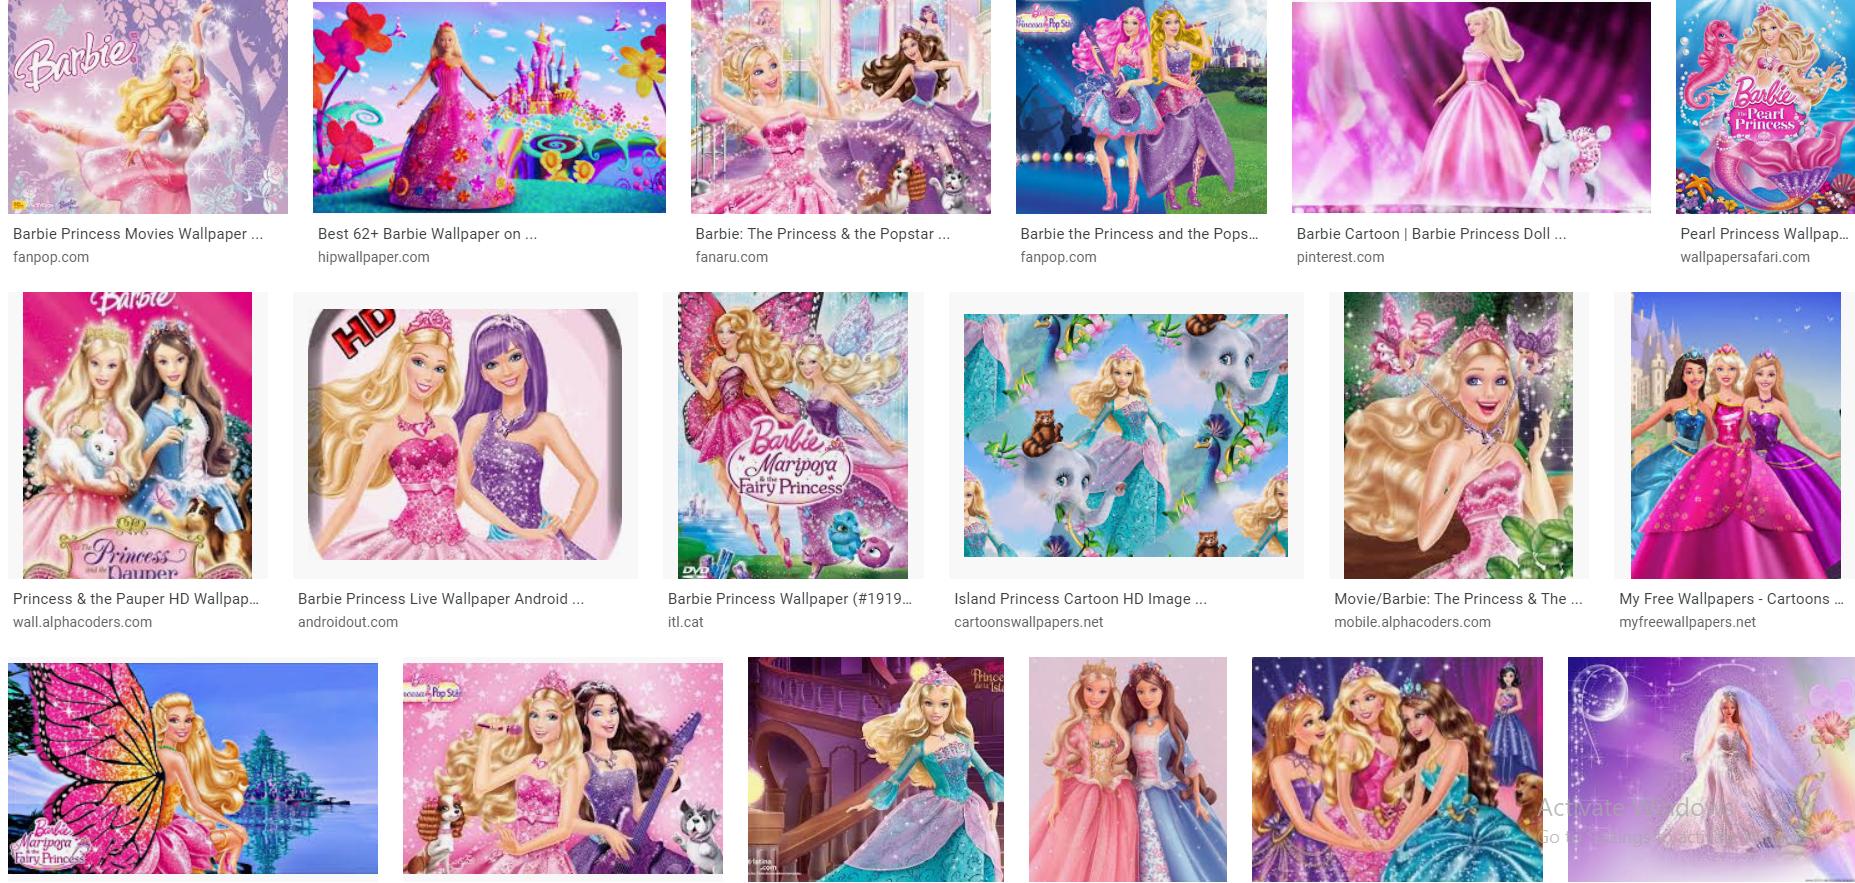 set of barbie pictures together